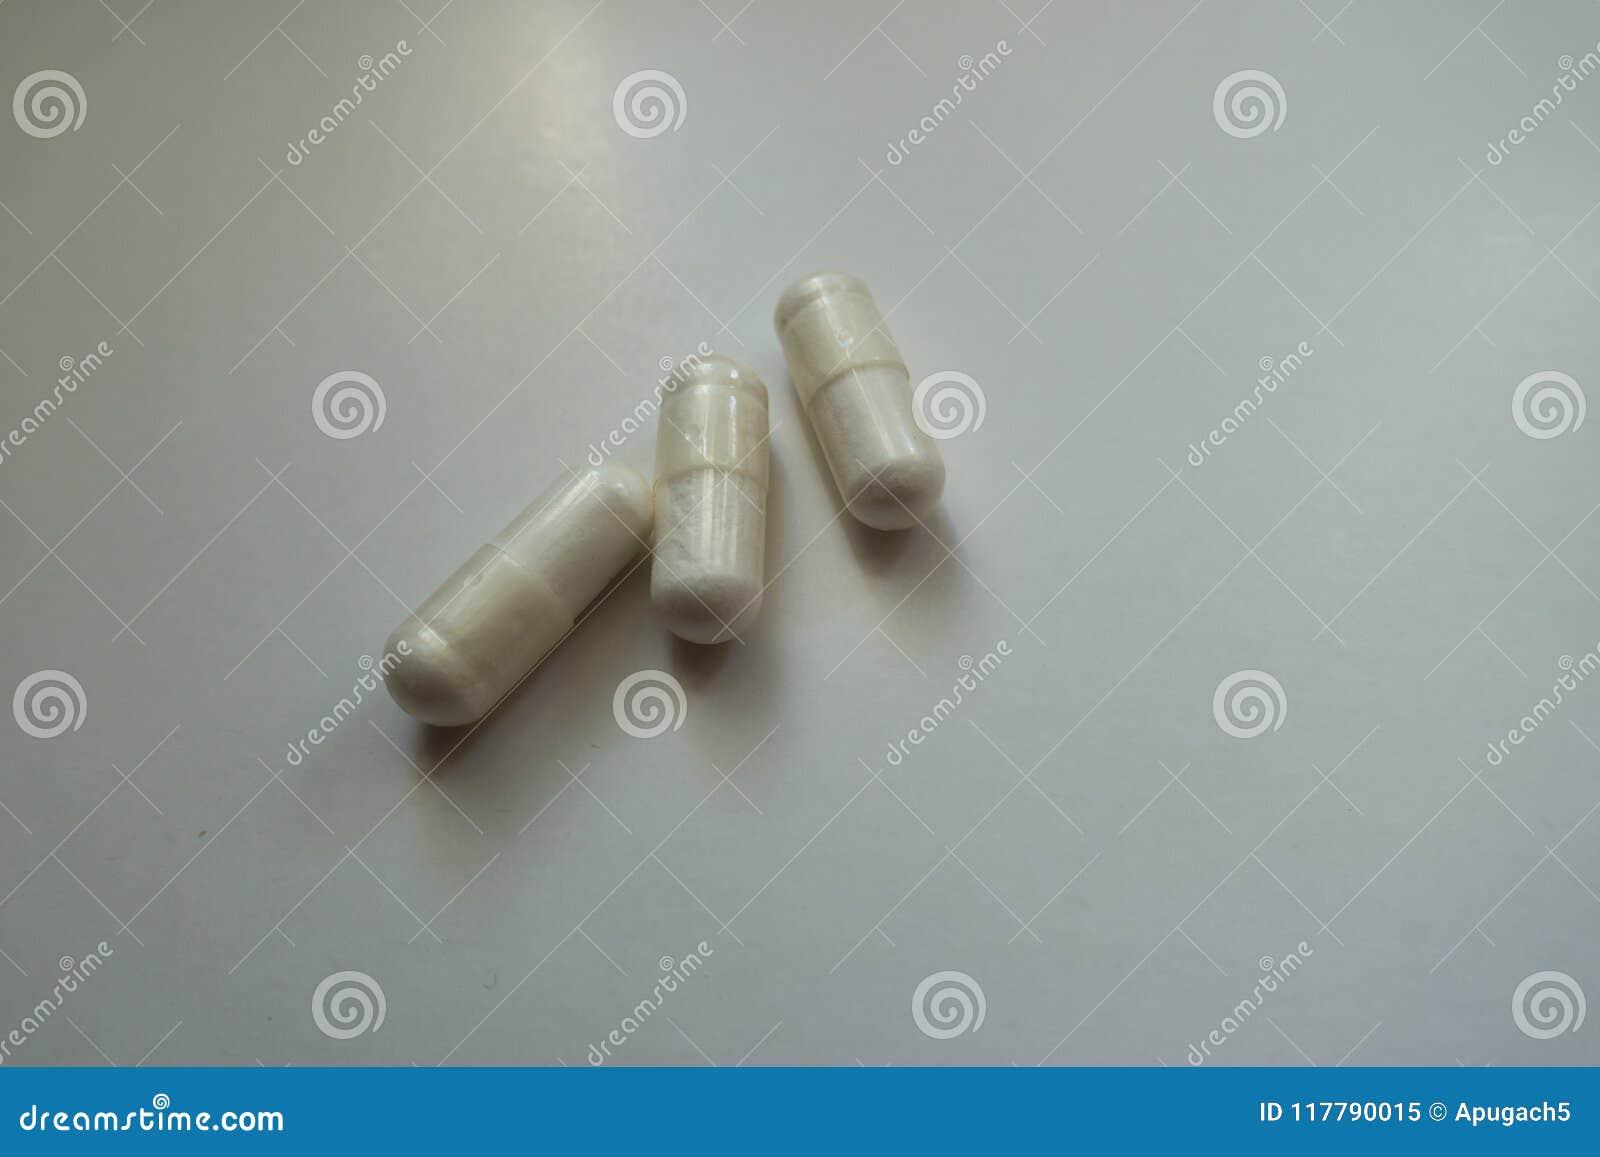 White Capsules Of Magnesium Citrate 3 Items Stock Image